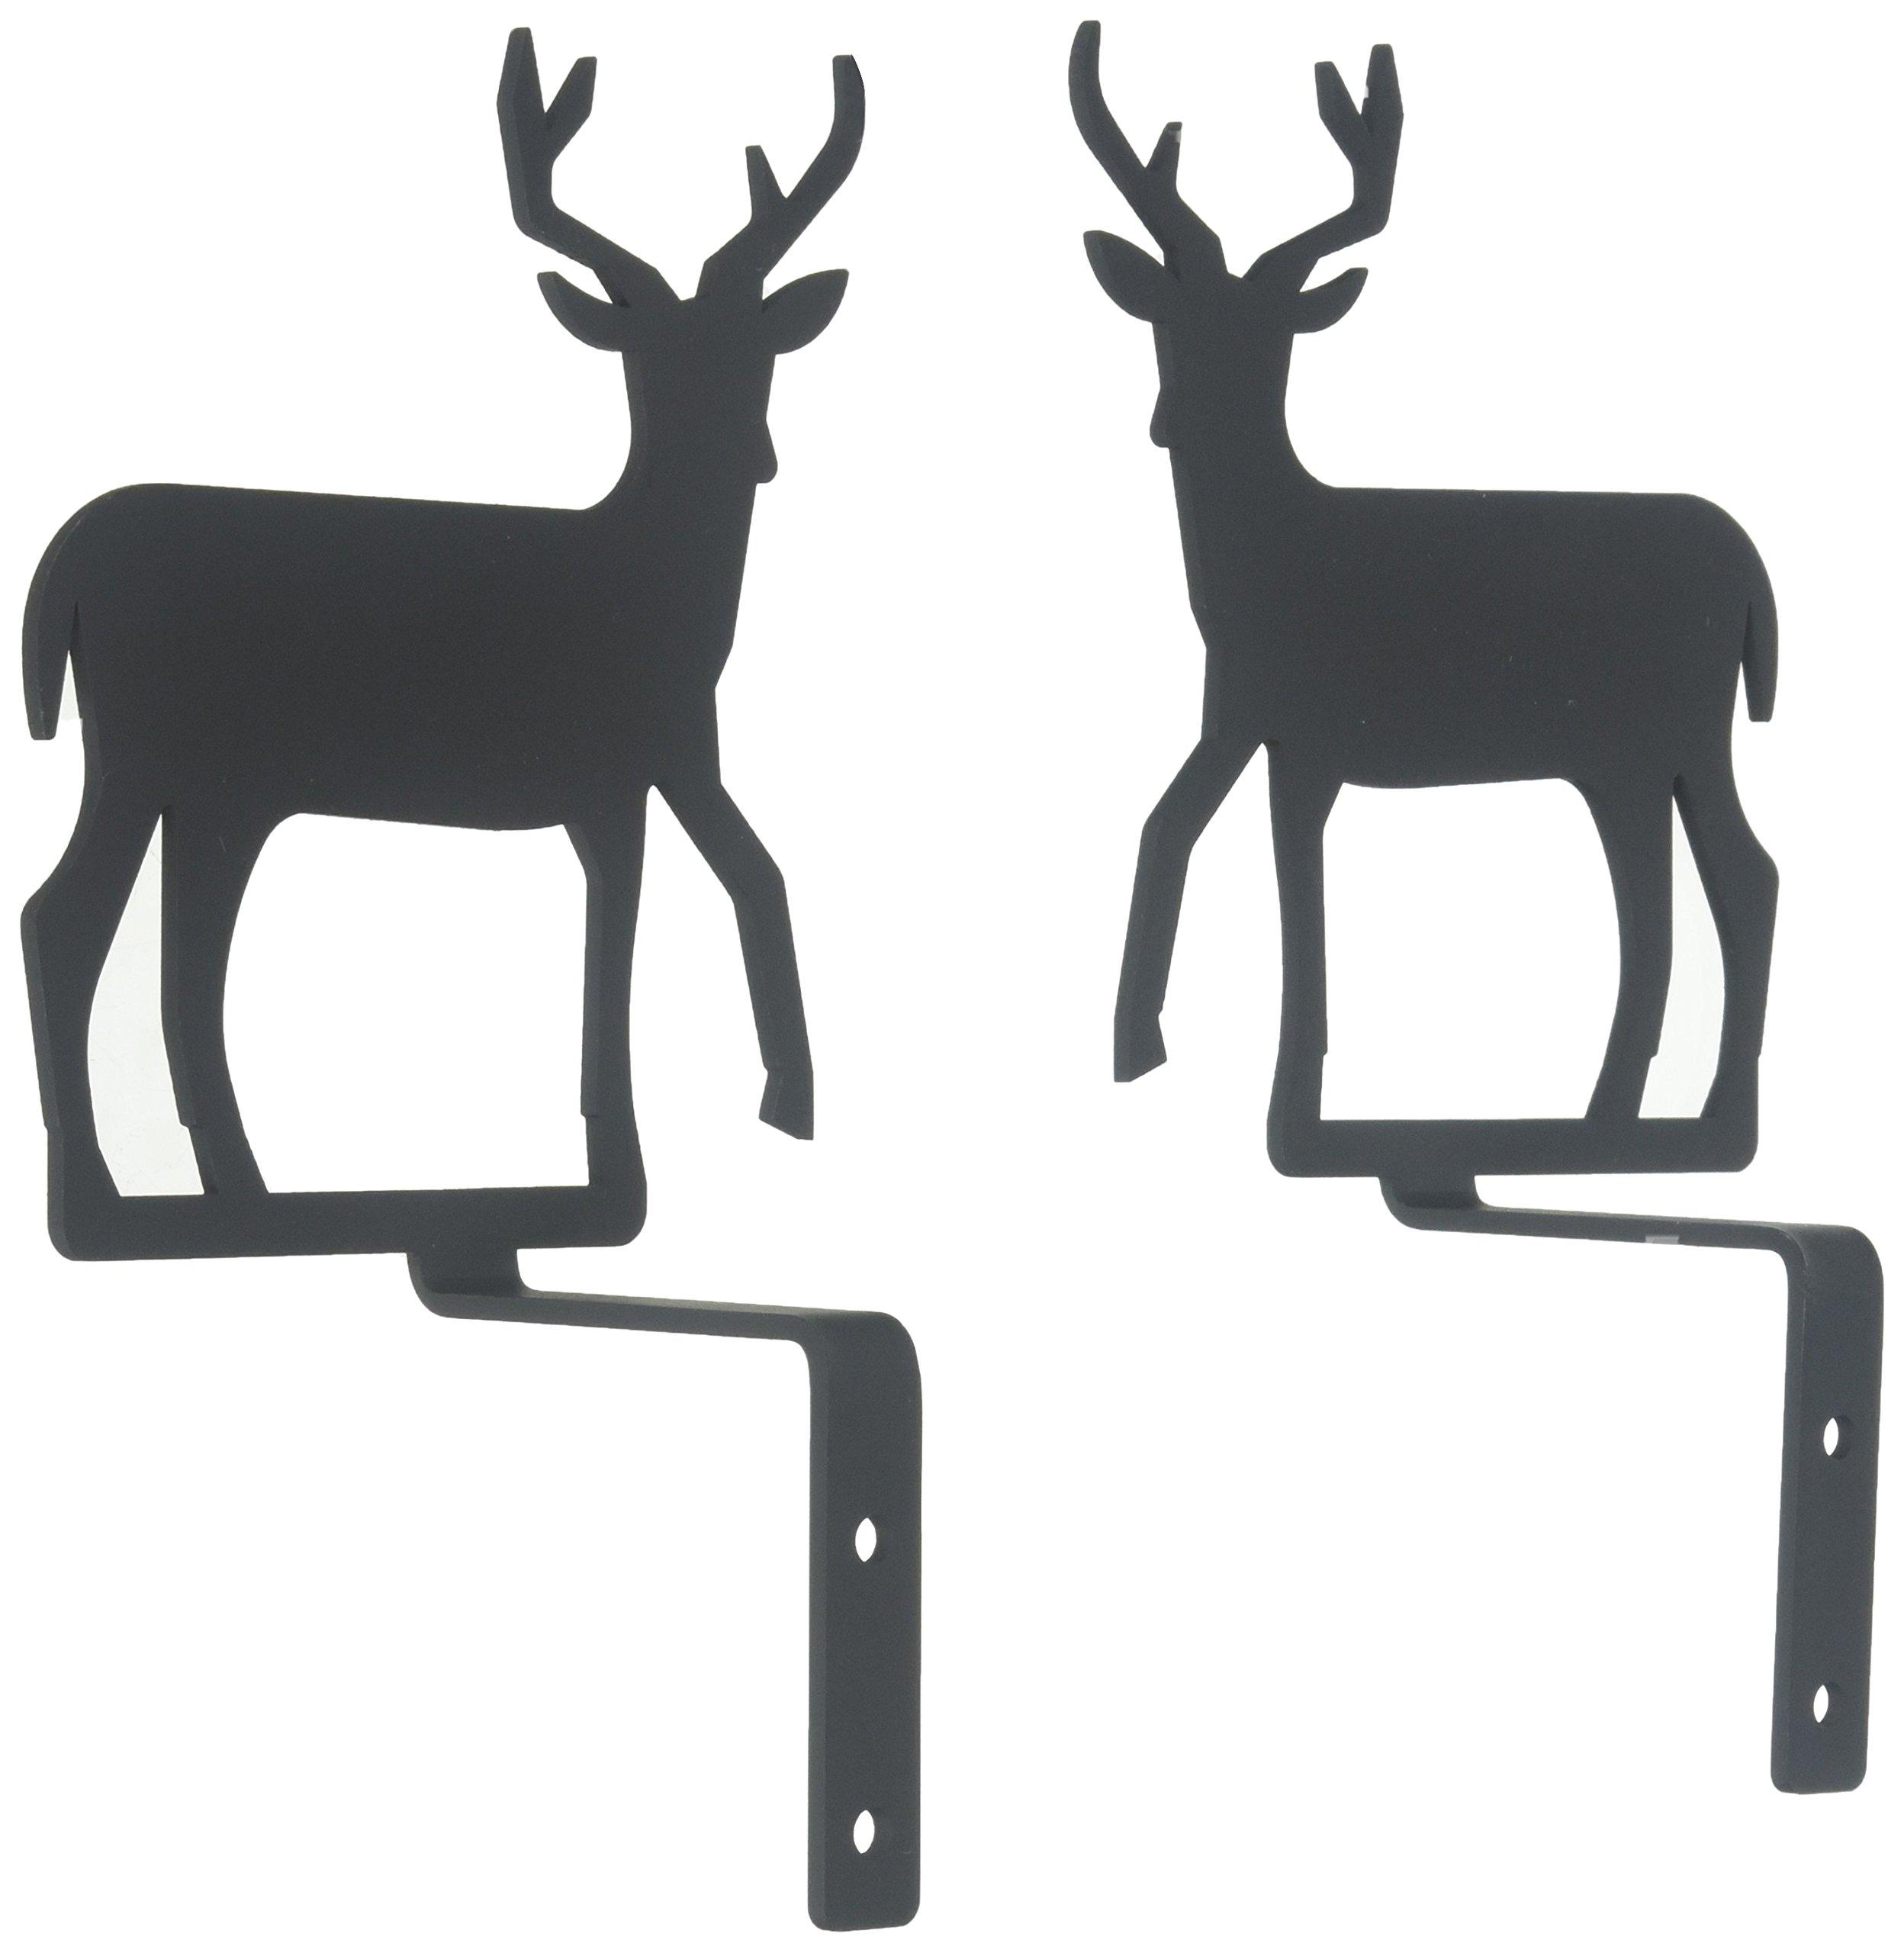 6.25 Inch Deer Curtain Swags